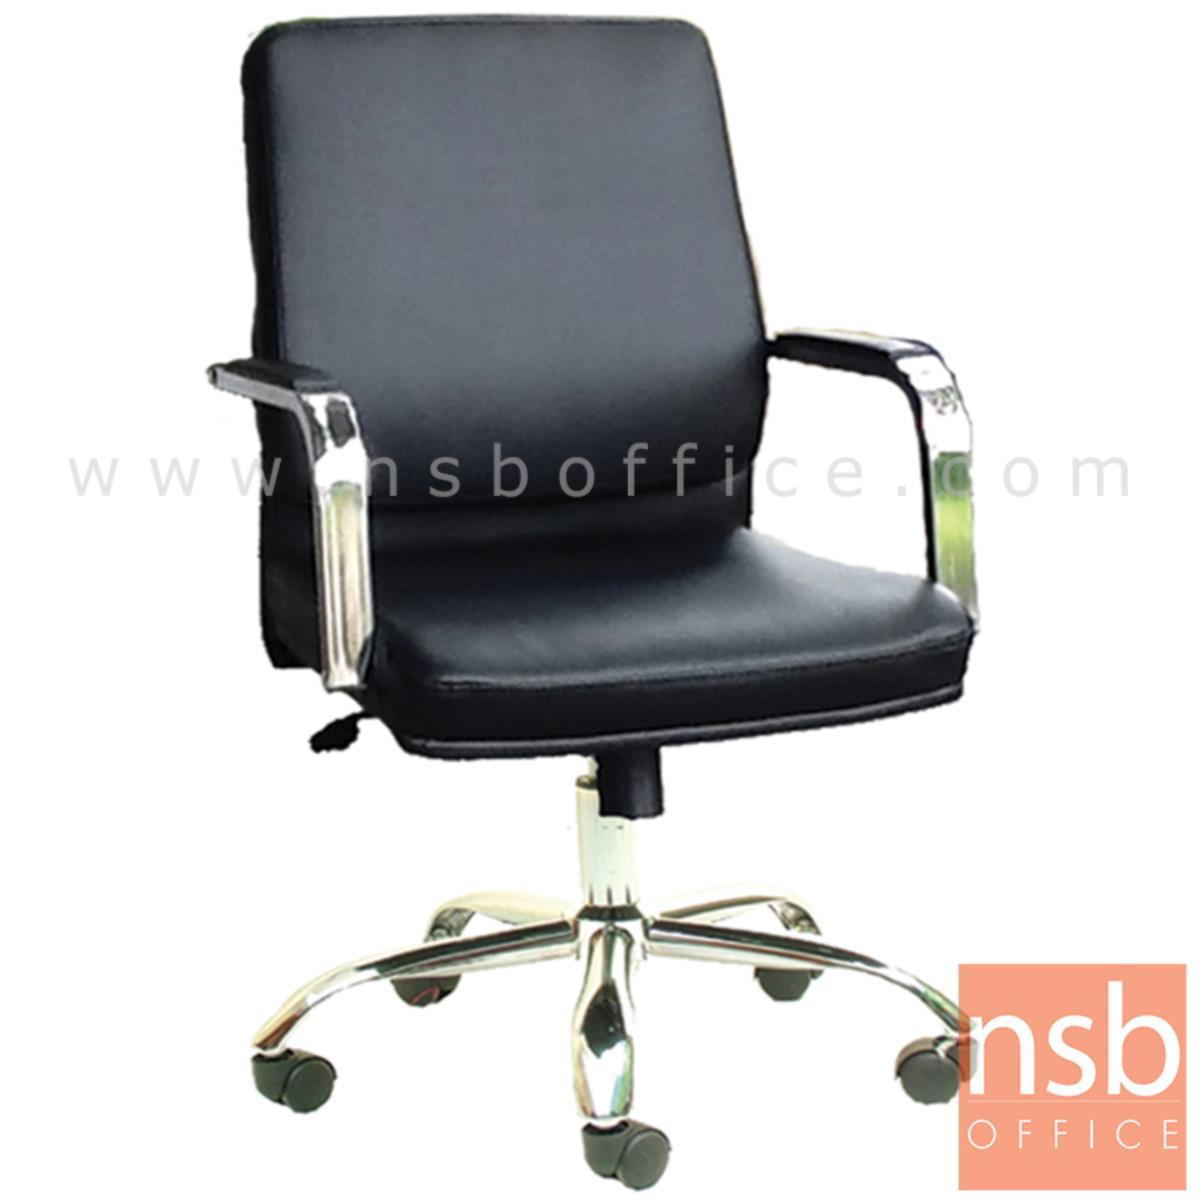 B03A321:เก้าอี้สำนักงาน รุ่น Topher (โทเฟอร์) โช๊คแก๊ส มีก้อนโยก